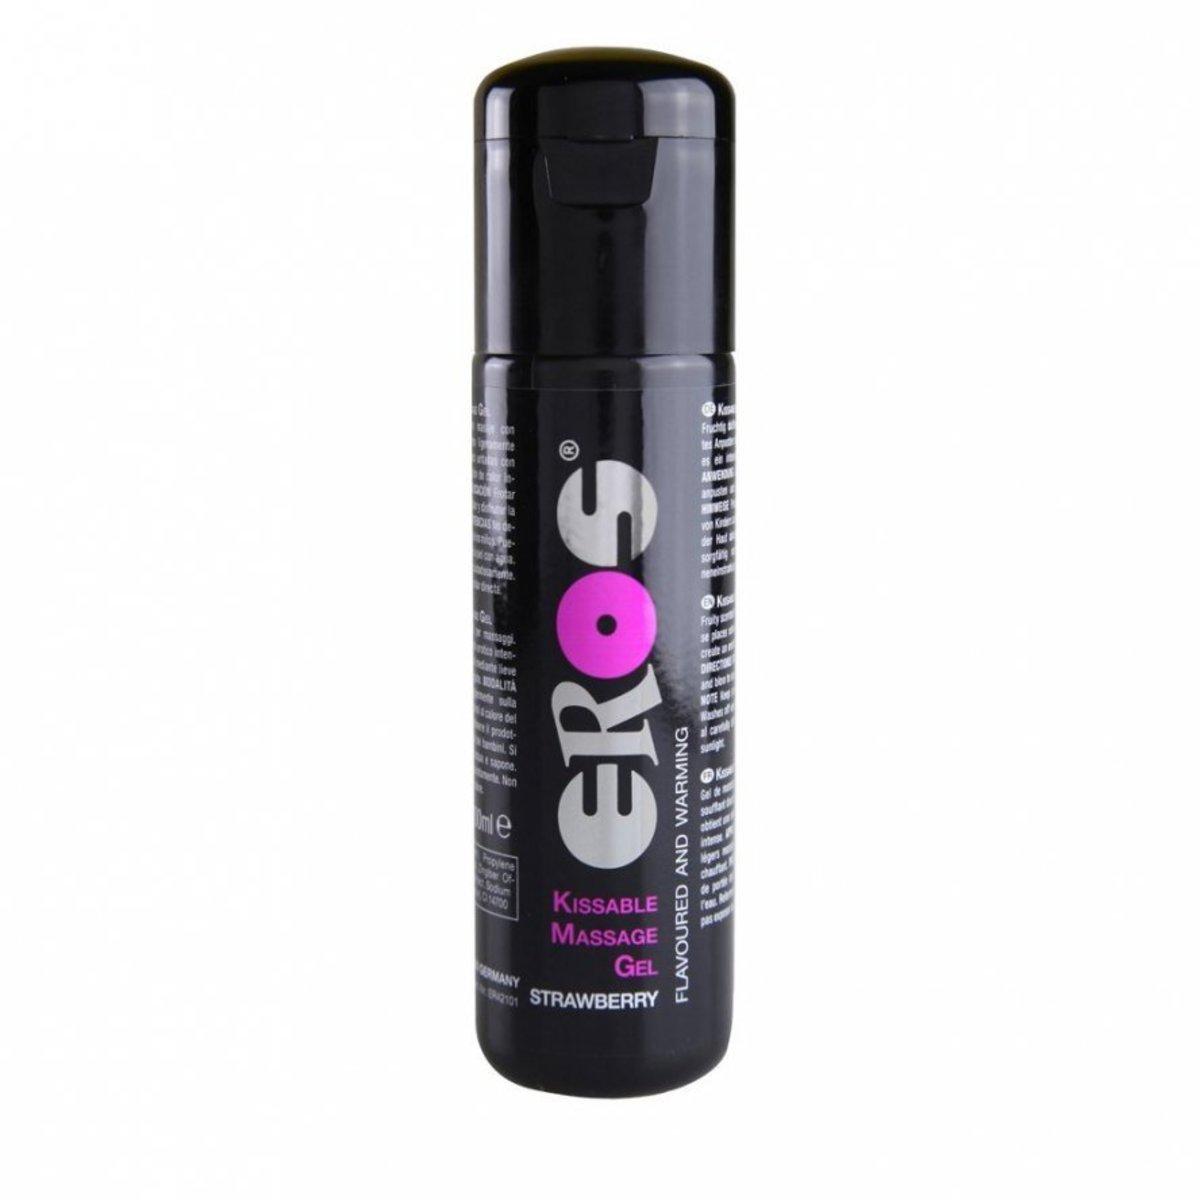 Eros - Kissable Massage Gel - 100ml - Strawberry